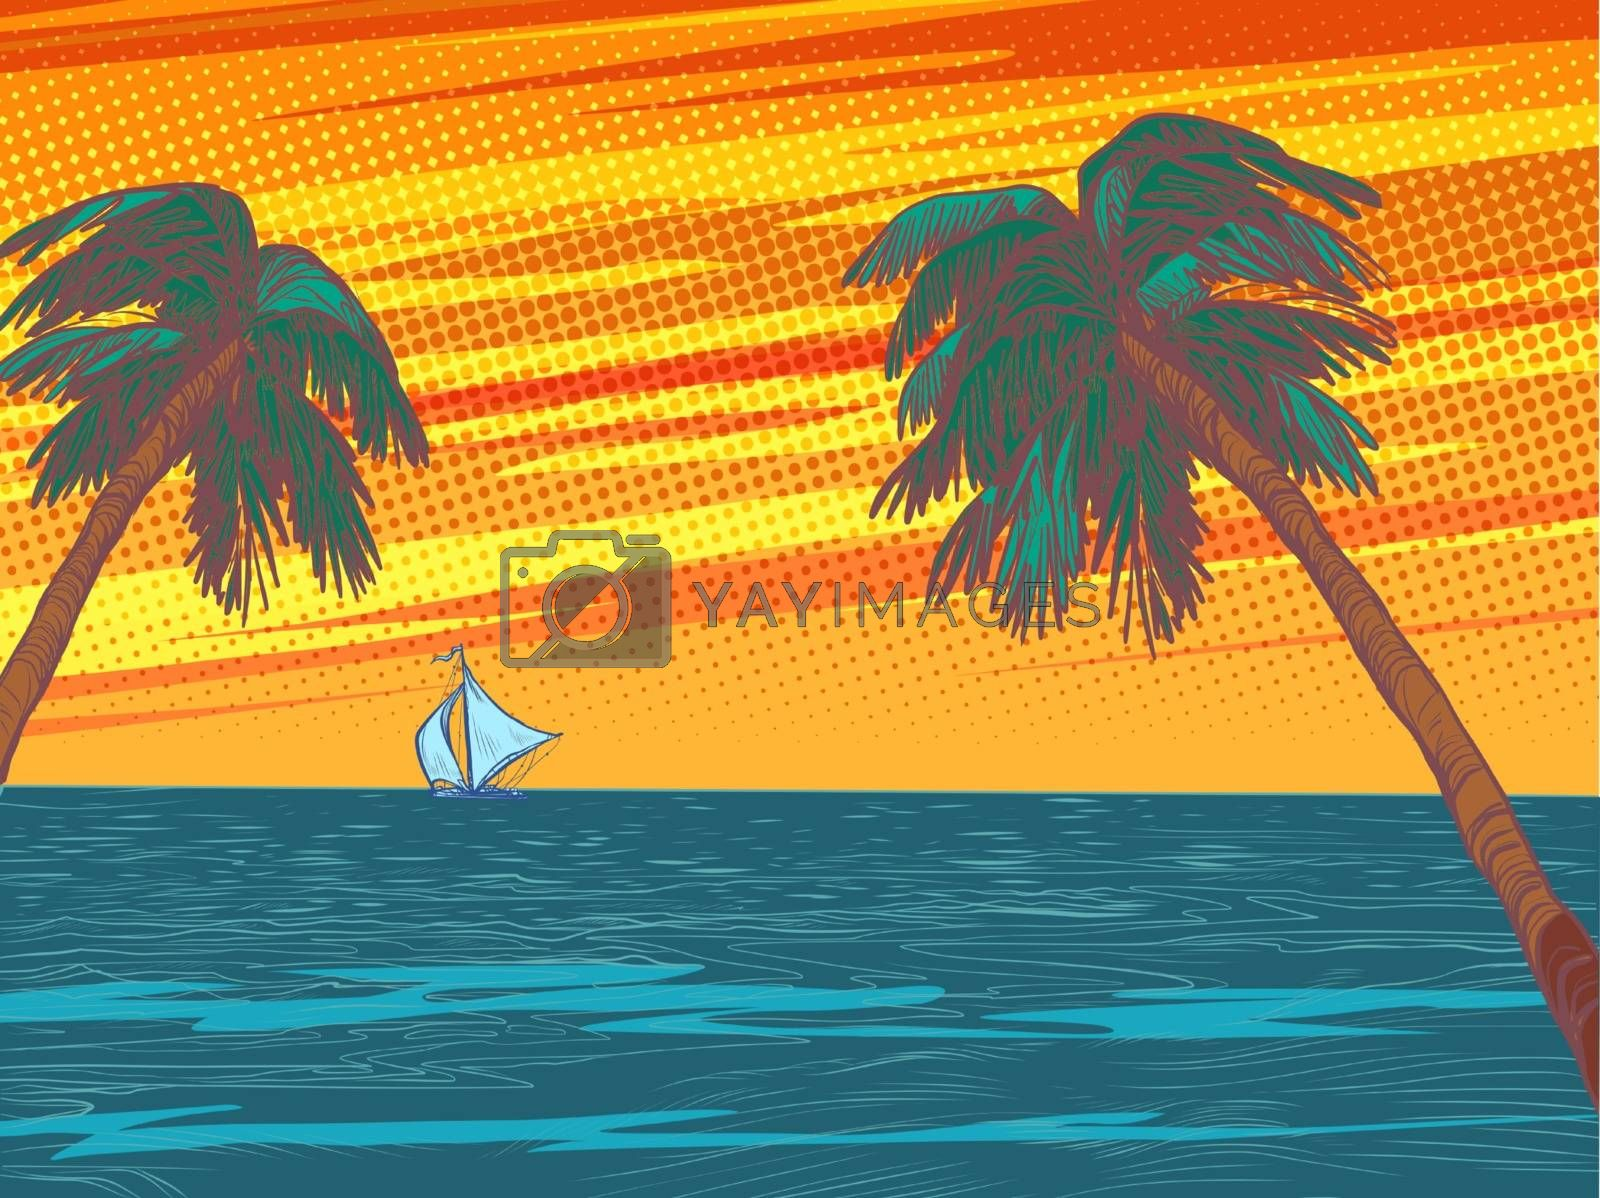 sunset beach resort palm trees sea. Pop art retro vector illustration vintage kitsch 50s 60s style